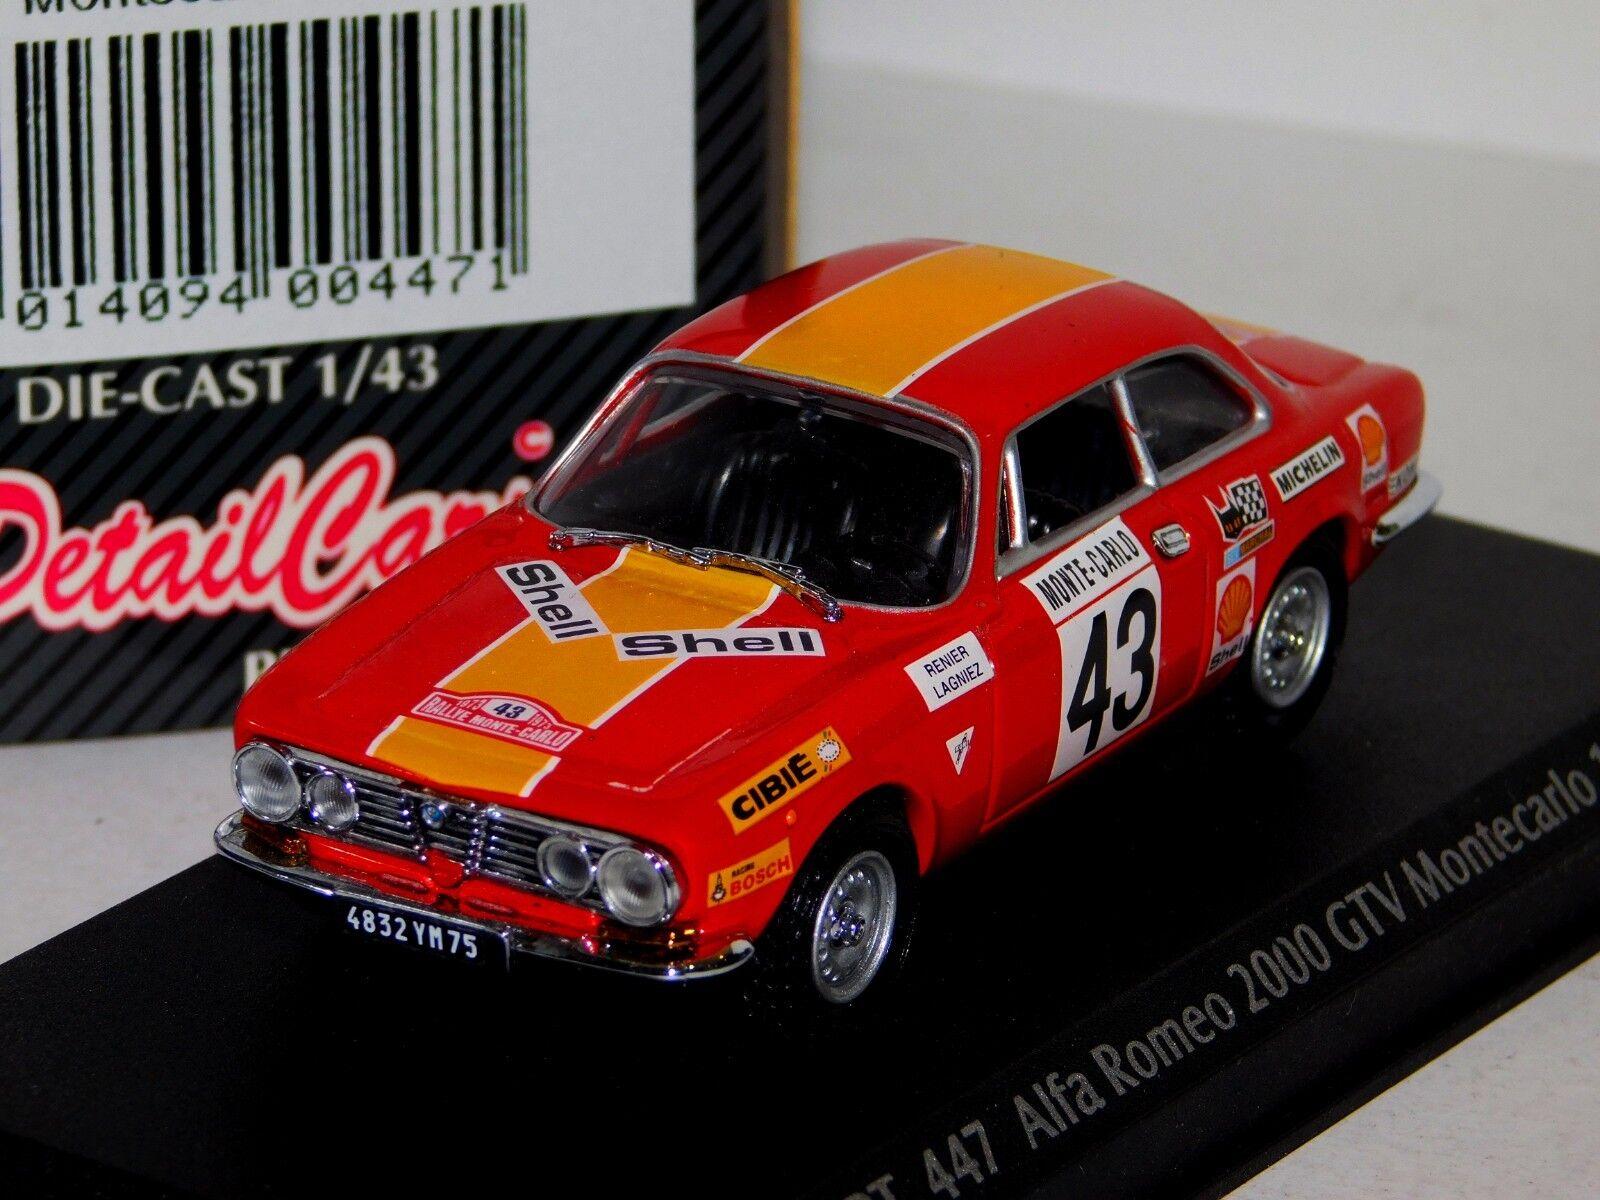 ALFA ROMEO 2000 GTV MONTE CARLO 1972 LAGNIEZ RENIER DETAIL CARS ART 447 1 43